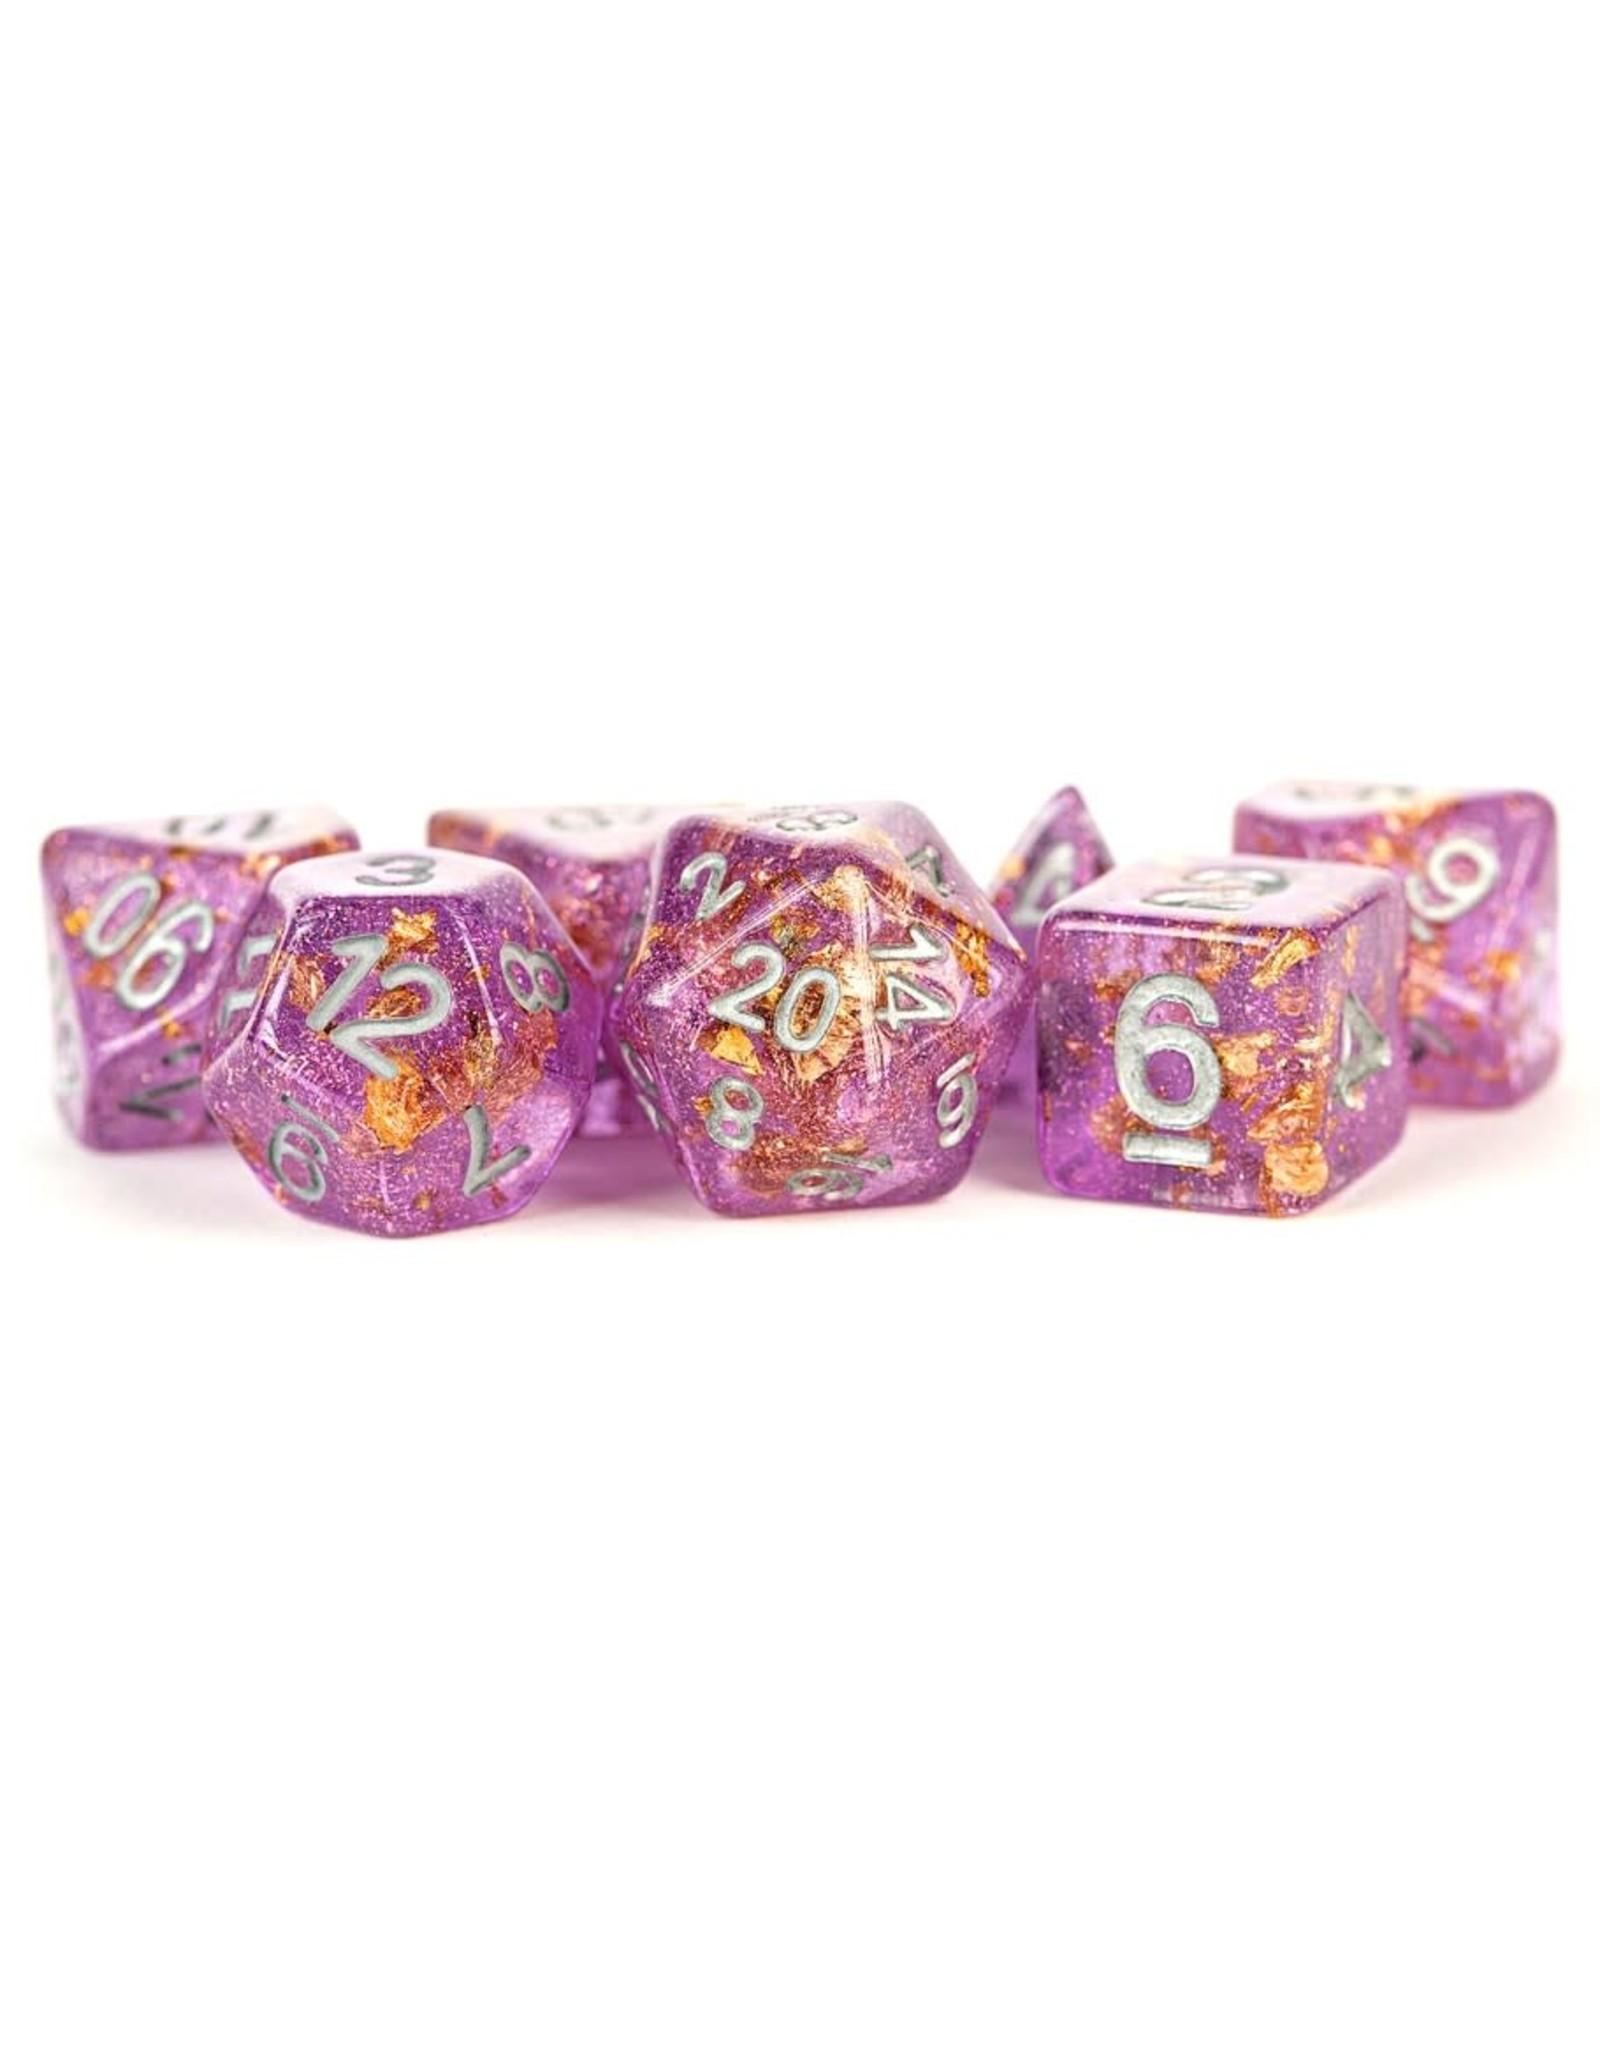 7 Die Set Foil PUGDsv